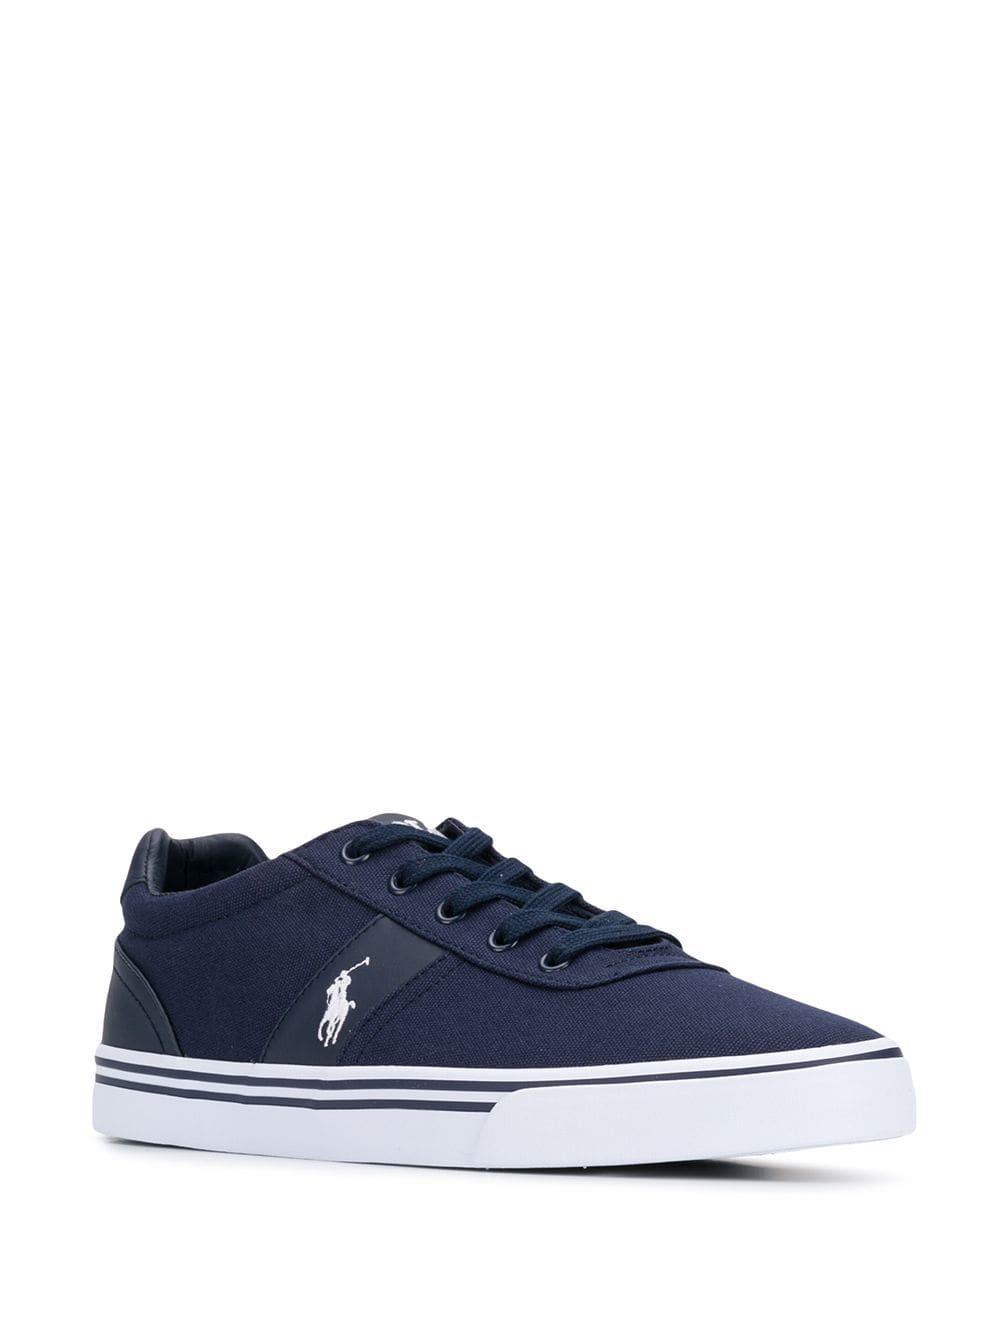 d54cfbc0fd0e8b Lyst - Polo Ralph Lauren Hanford Low-top Sneakers in Blue for Men